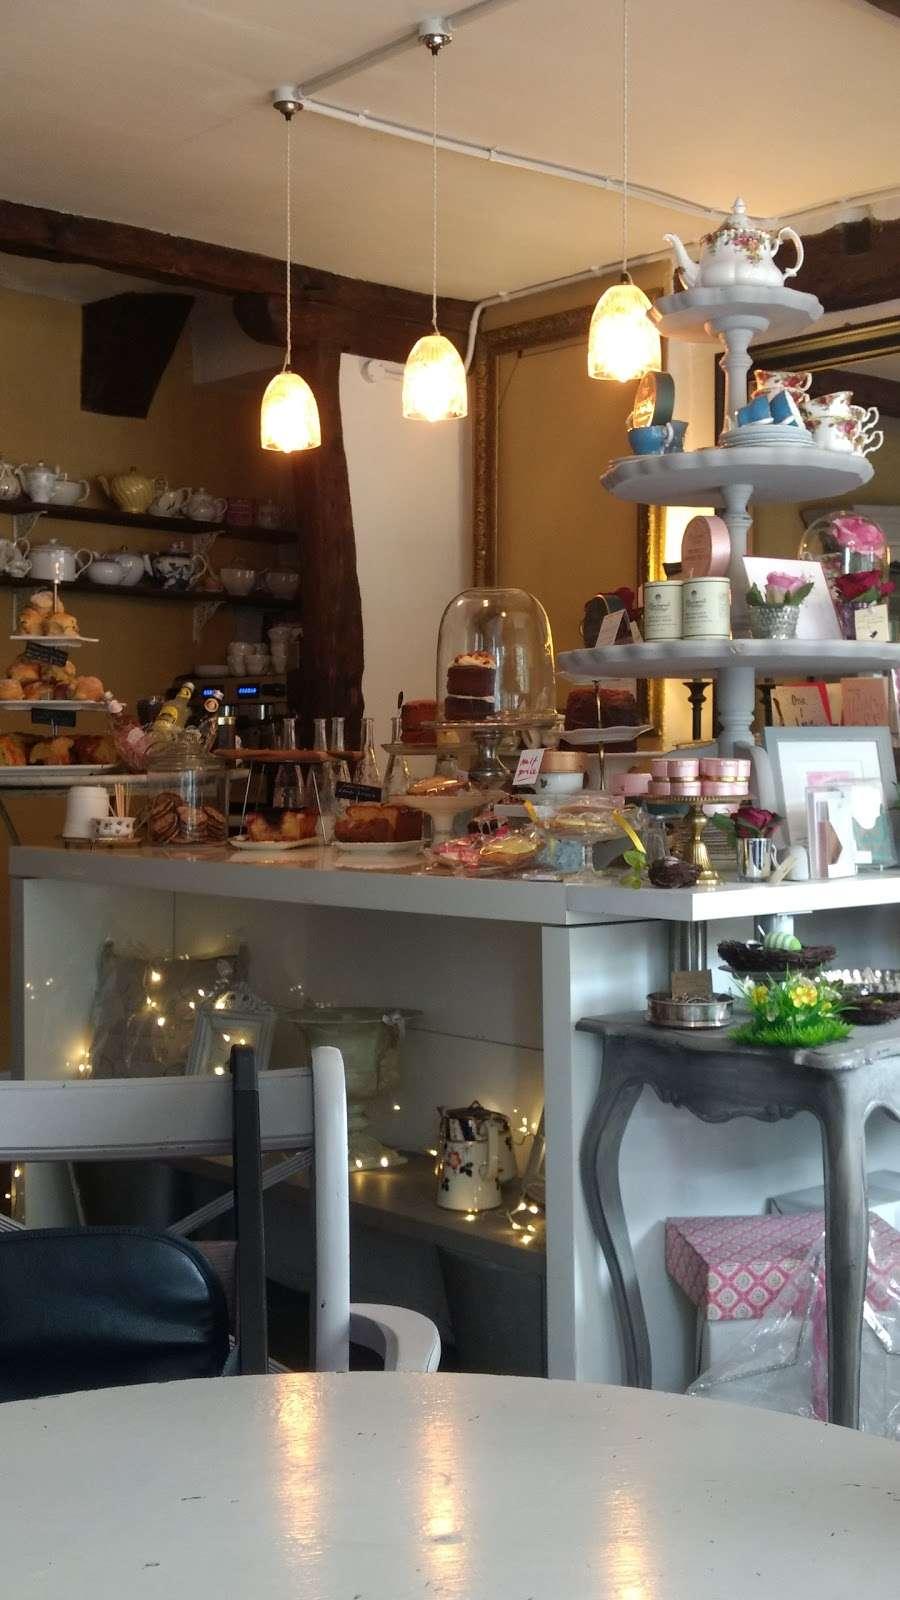 Lamingtons - cafe    Photo 9 of 10   Address: 25 High St, Bletchingley, Redhill RH1 4PB, UK   Phone: 07751 405020